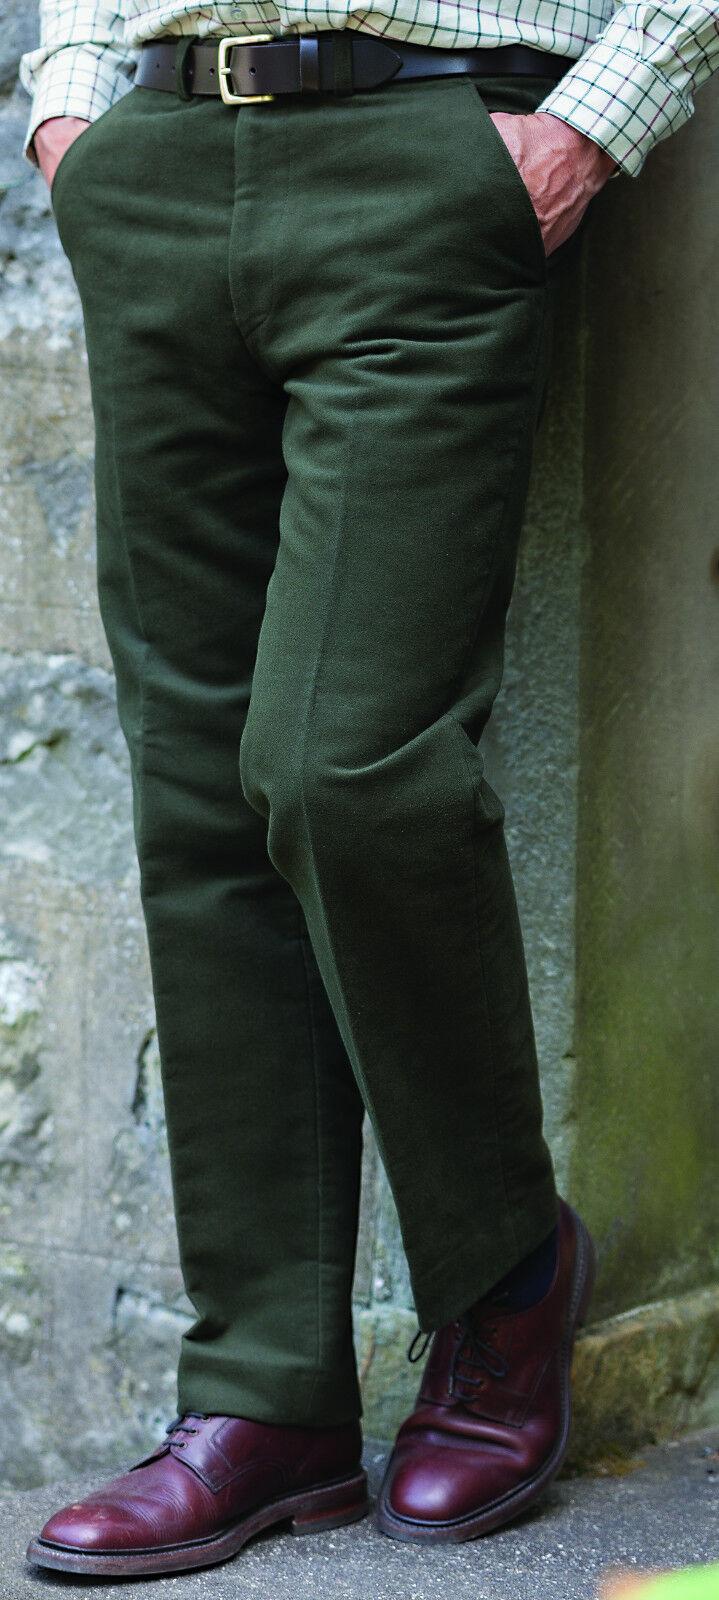 Hoggs of Fife Monarch Moleskin Trousers-peso  pesado 100% algodón  wholesape barato